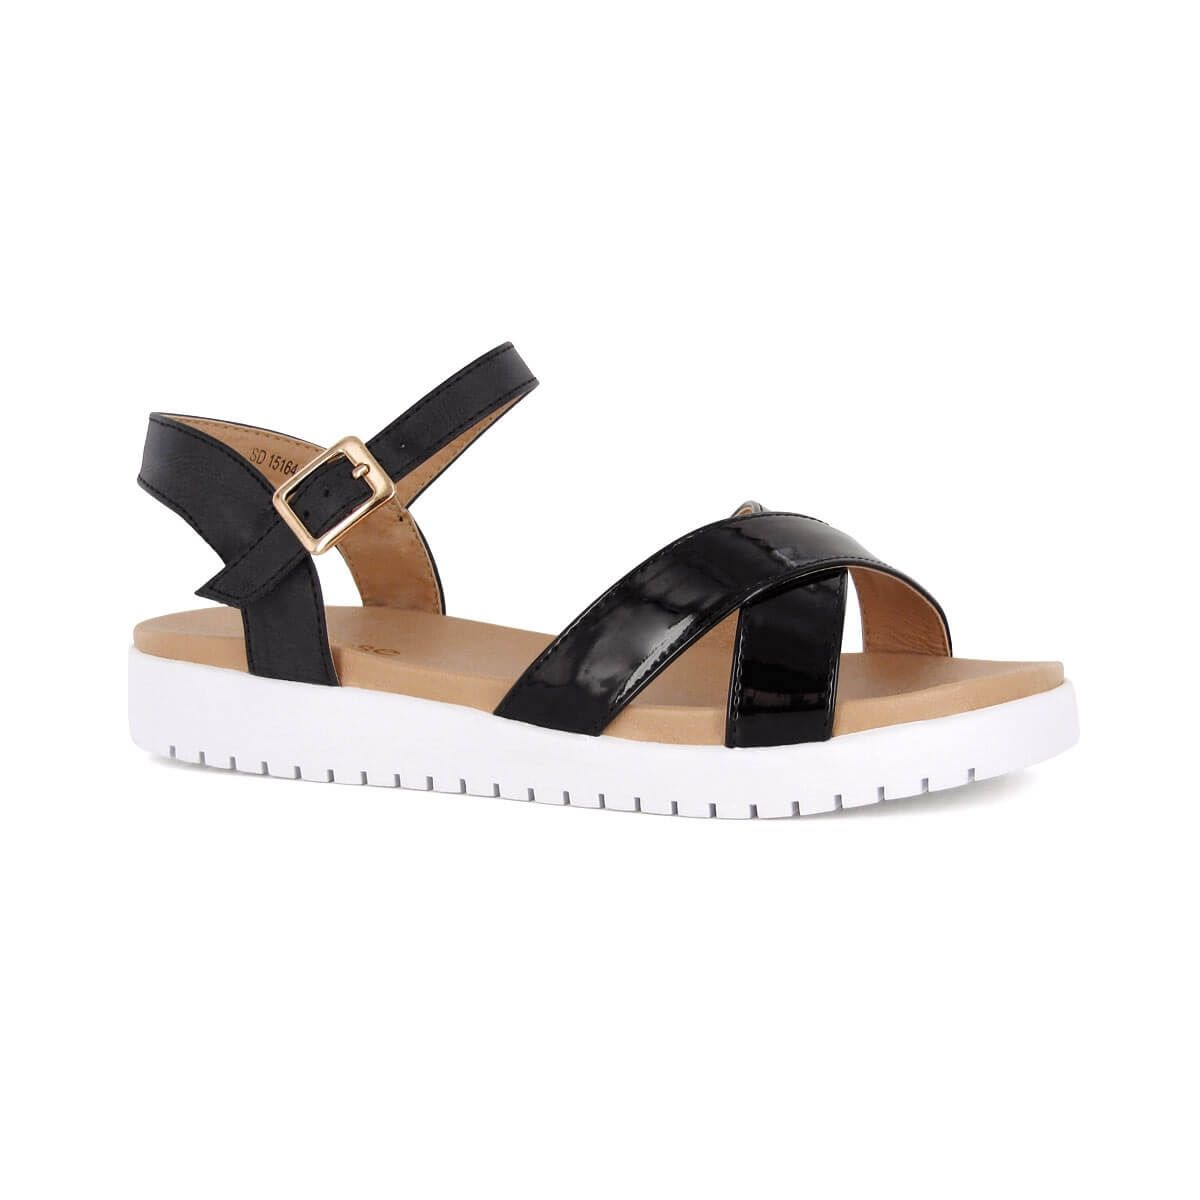 Sandales semelle plateau Noir bjw9w3V8he